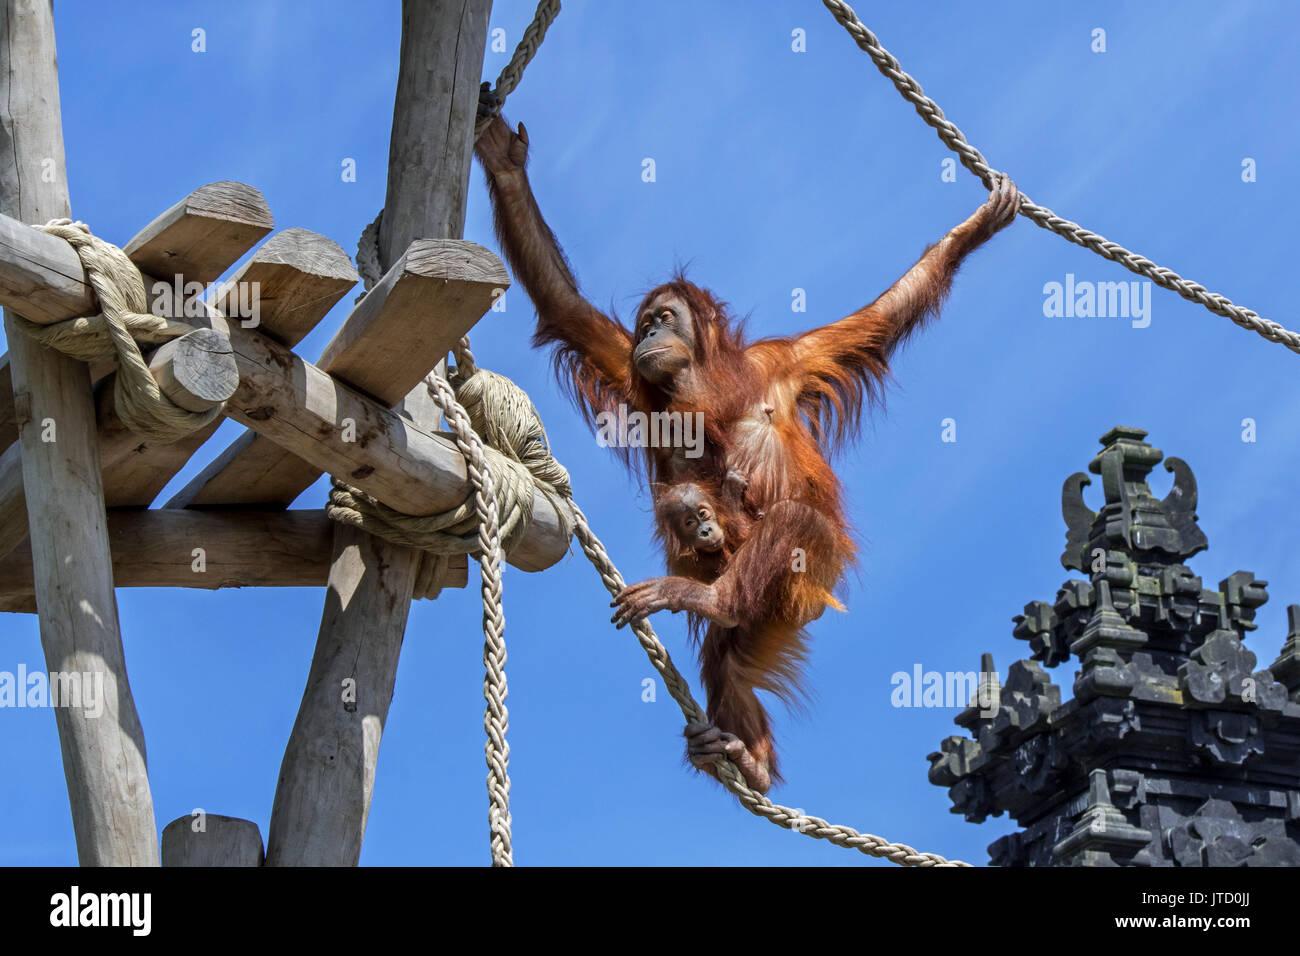 sumatran-orangutan-orang-utang-pongo-abelii-female-with-baby-clinging-JTD0JJ.jpg